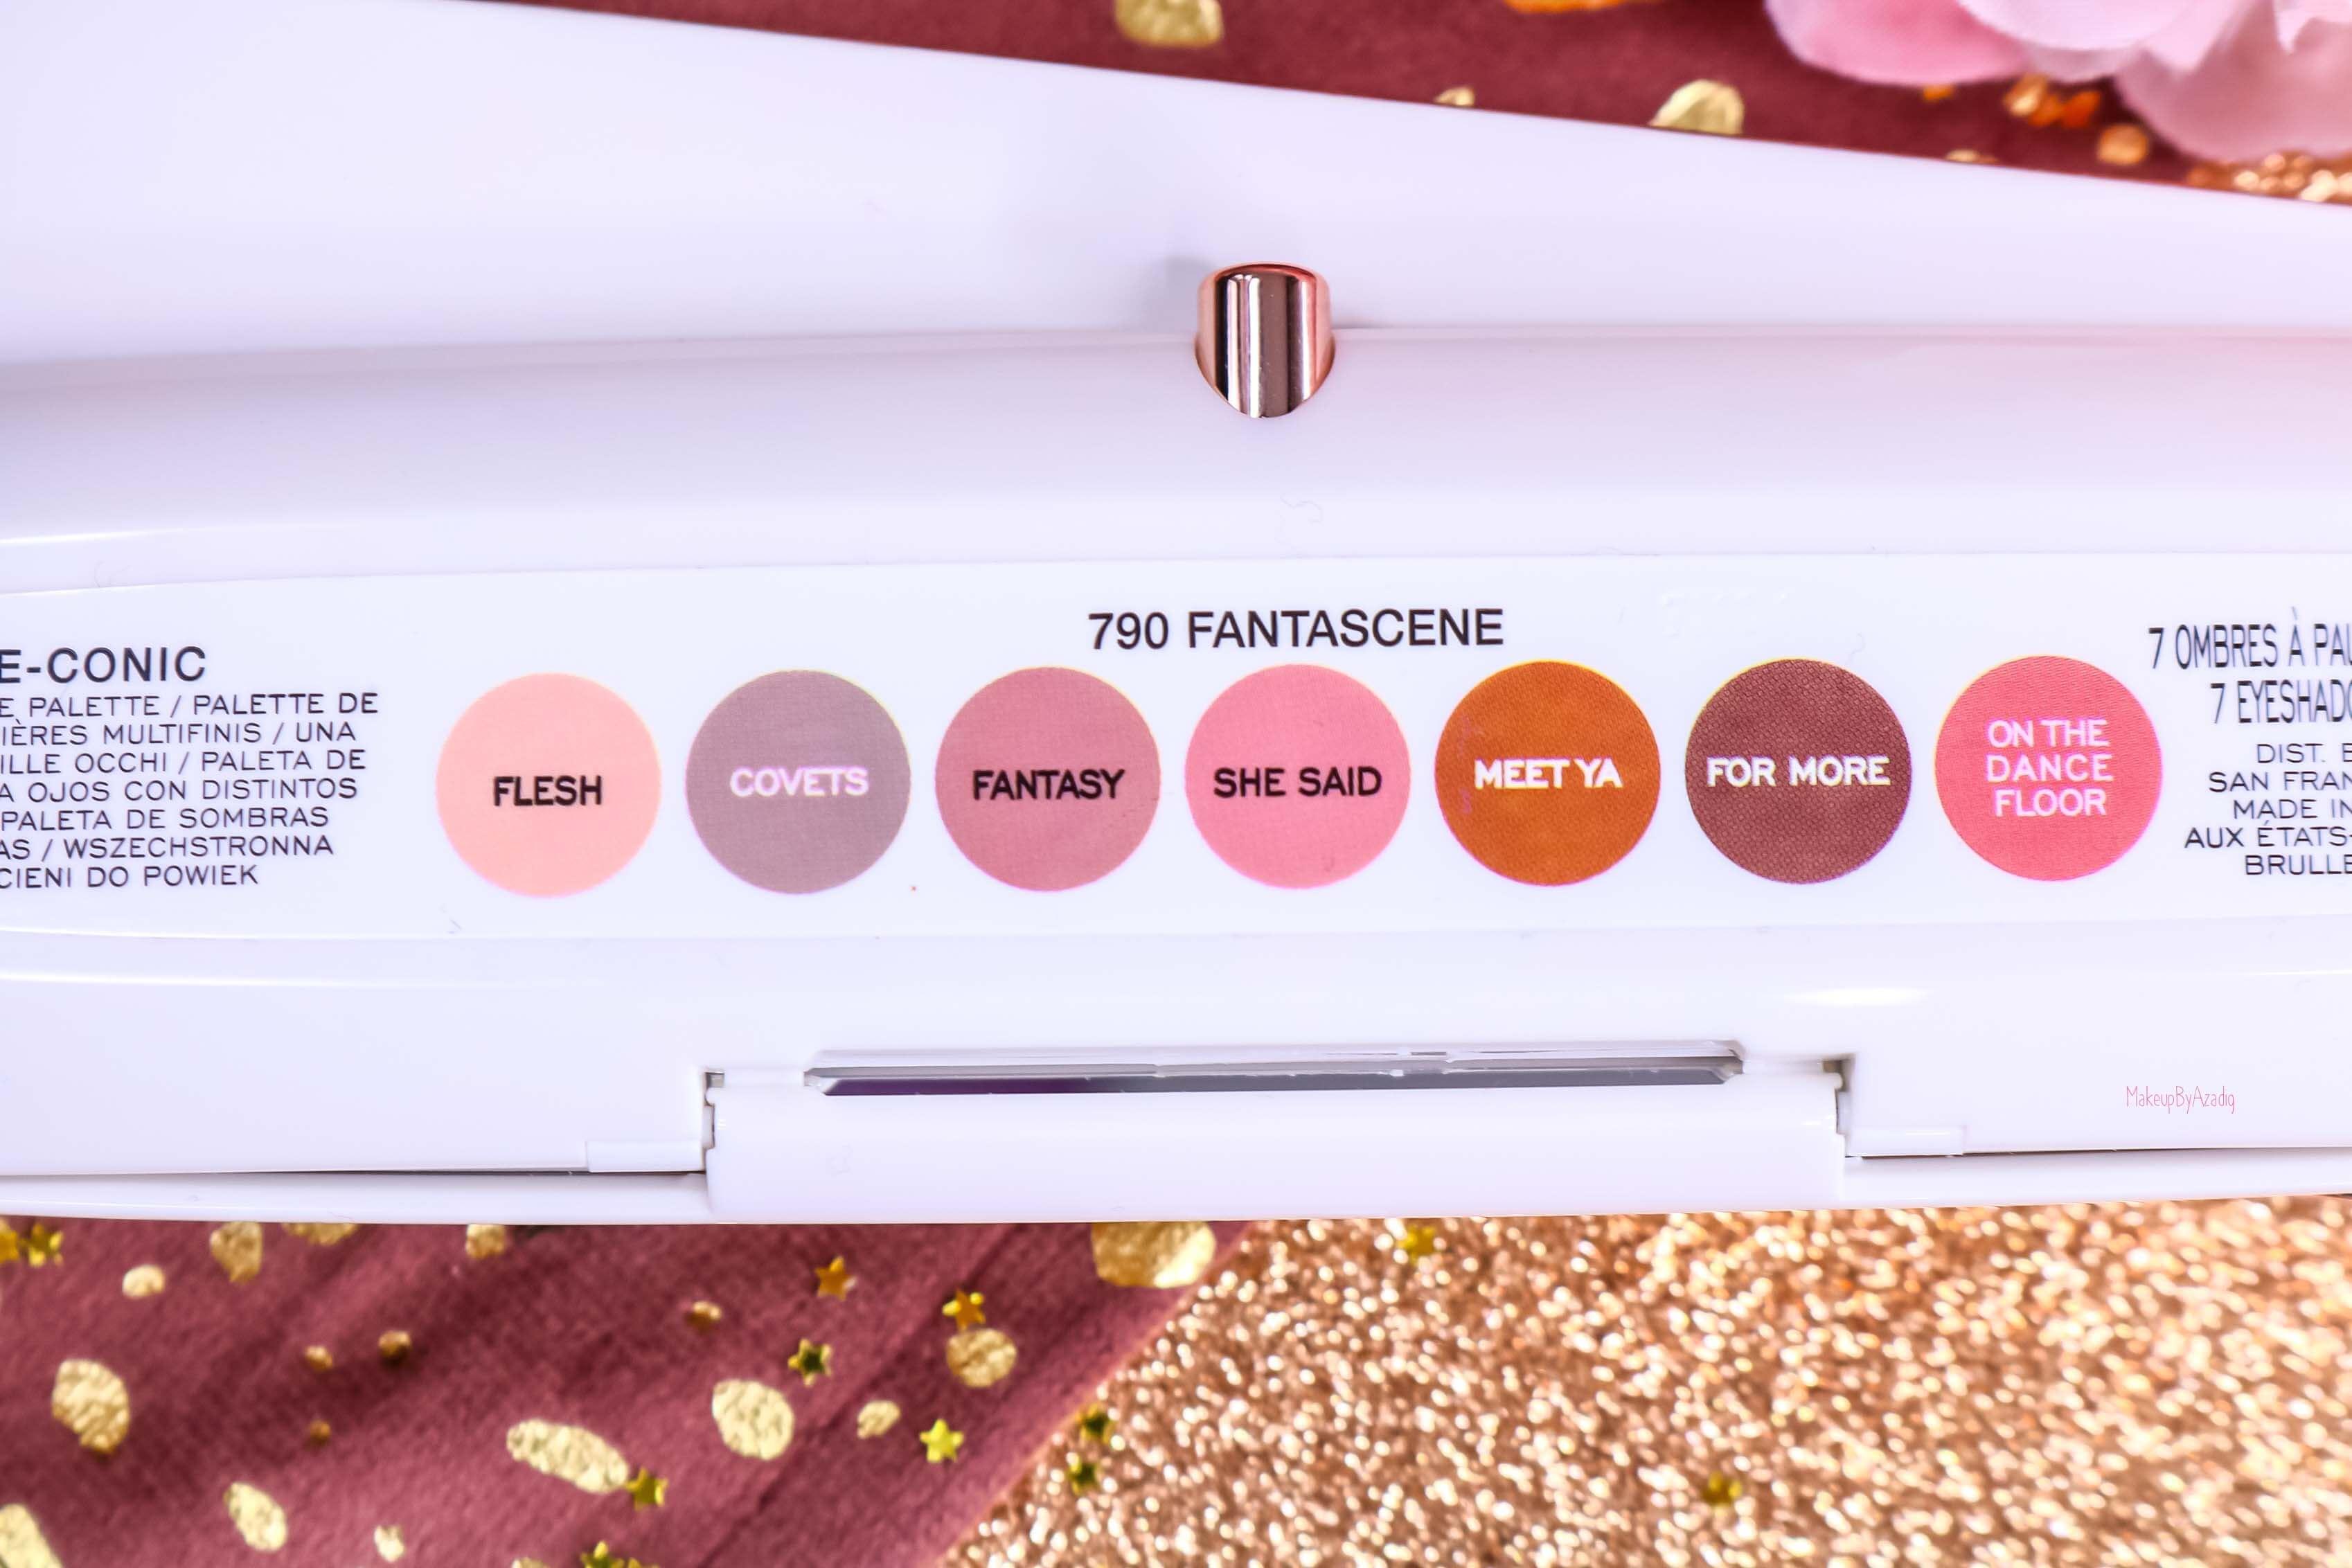 revue-palette-fards-paupieres-eye-conic-fantascene-marc-jacobs-gold-rose-sephora-france-avis-prix-swatch-tenue-makeupbyazadig-noms